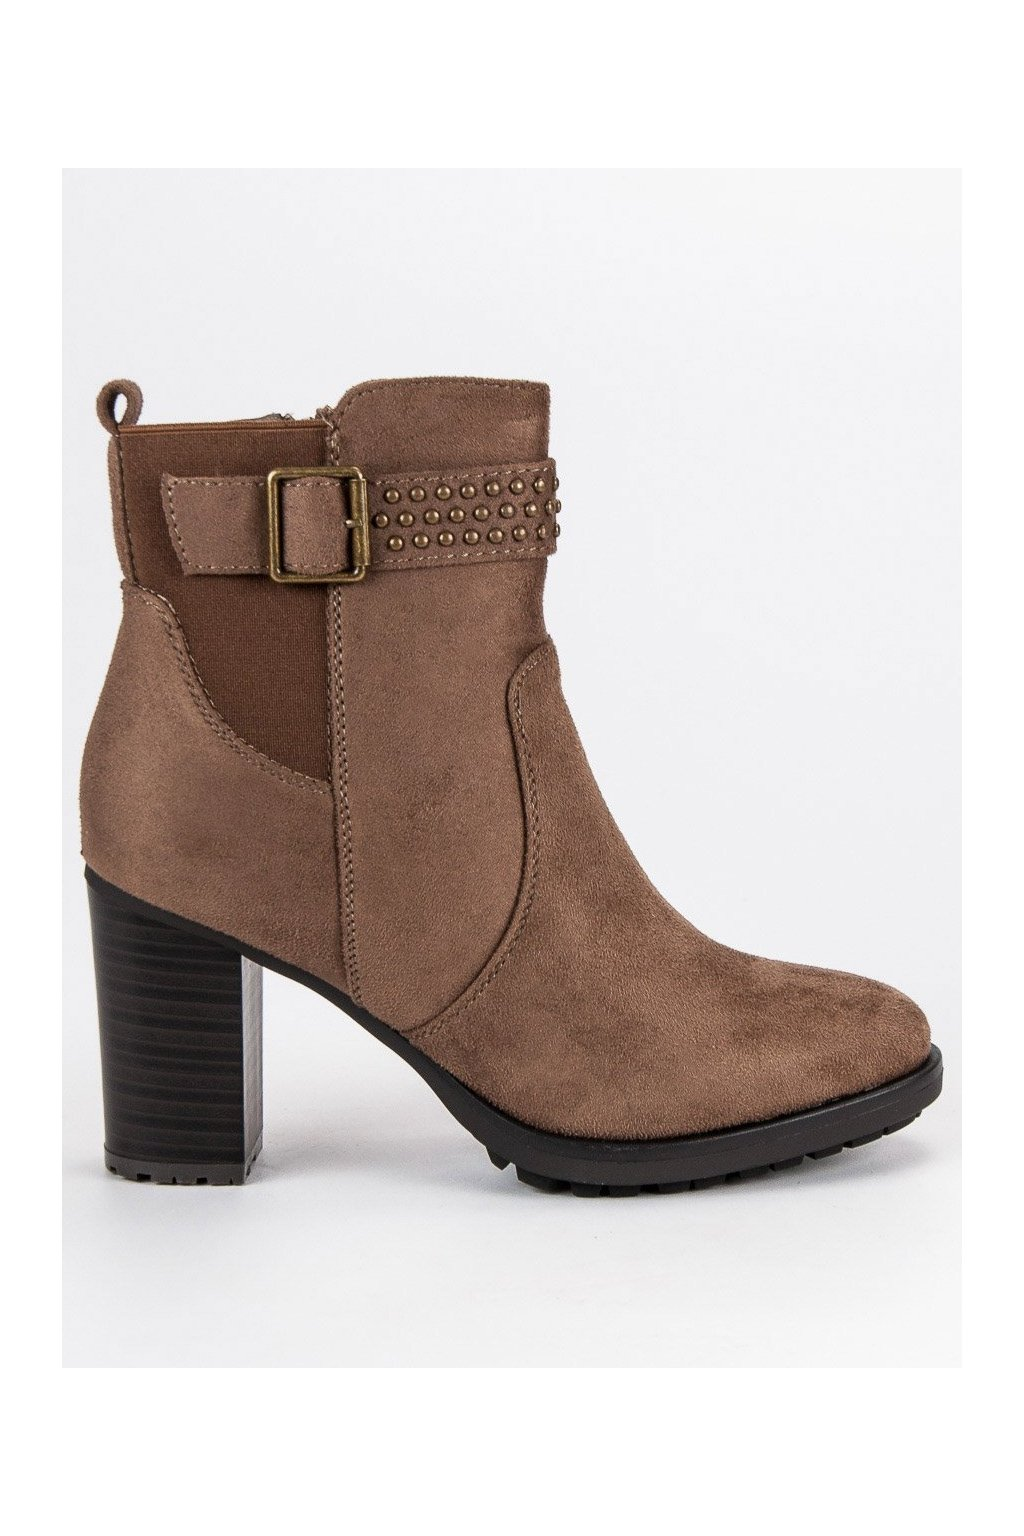 Béžové topánky na vysokom opätku Super Me a48d1b894b6